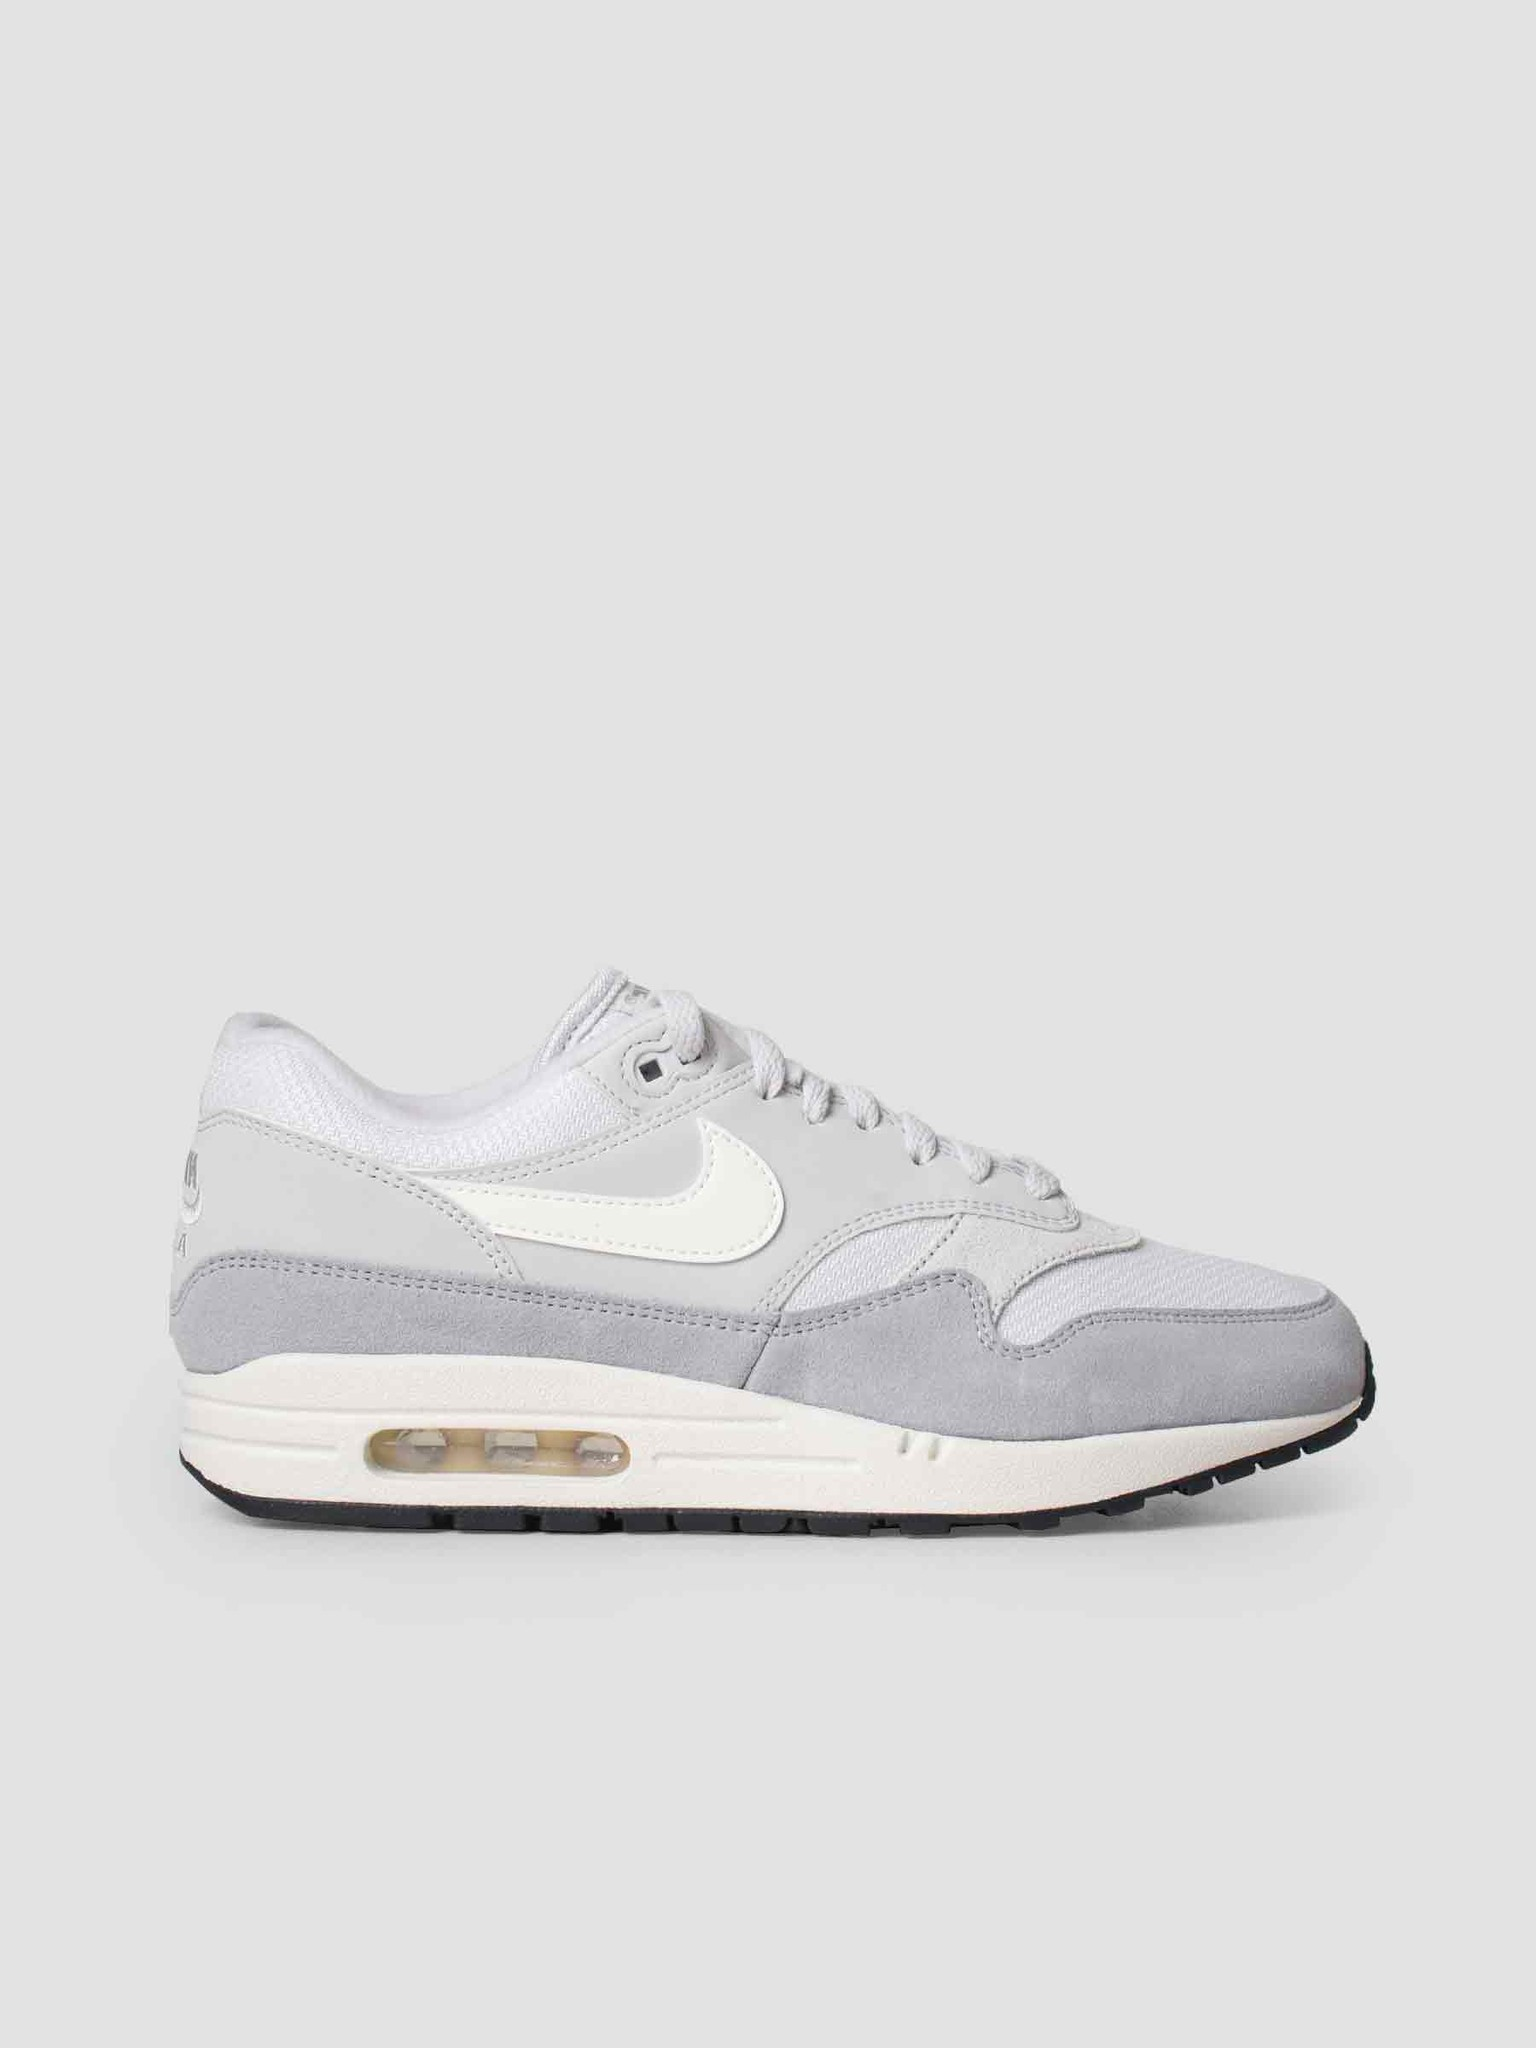 Nike Nike Air Max 1 Shoe Vast Grey Sail-Sail-Wolf Grey Ah8145-011